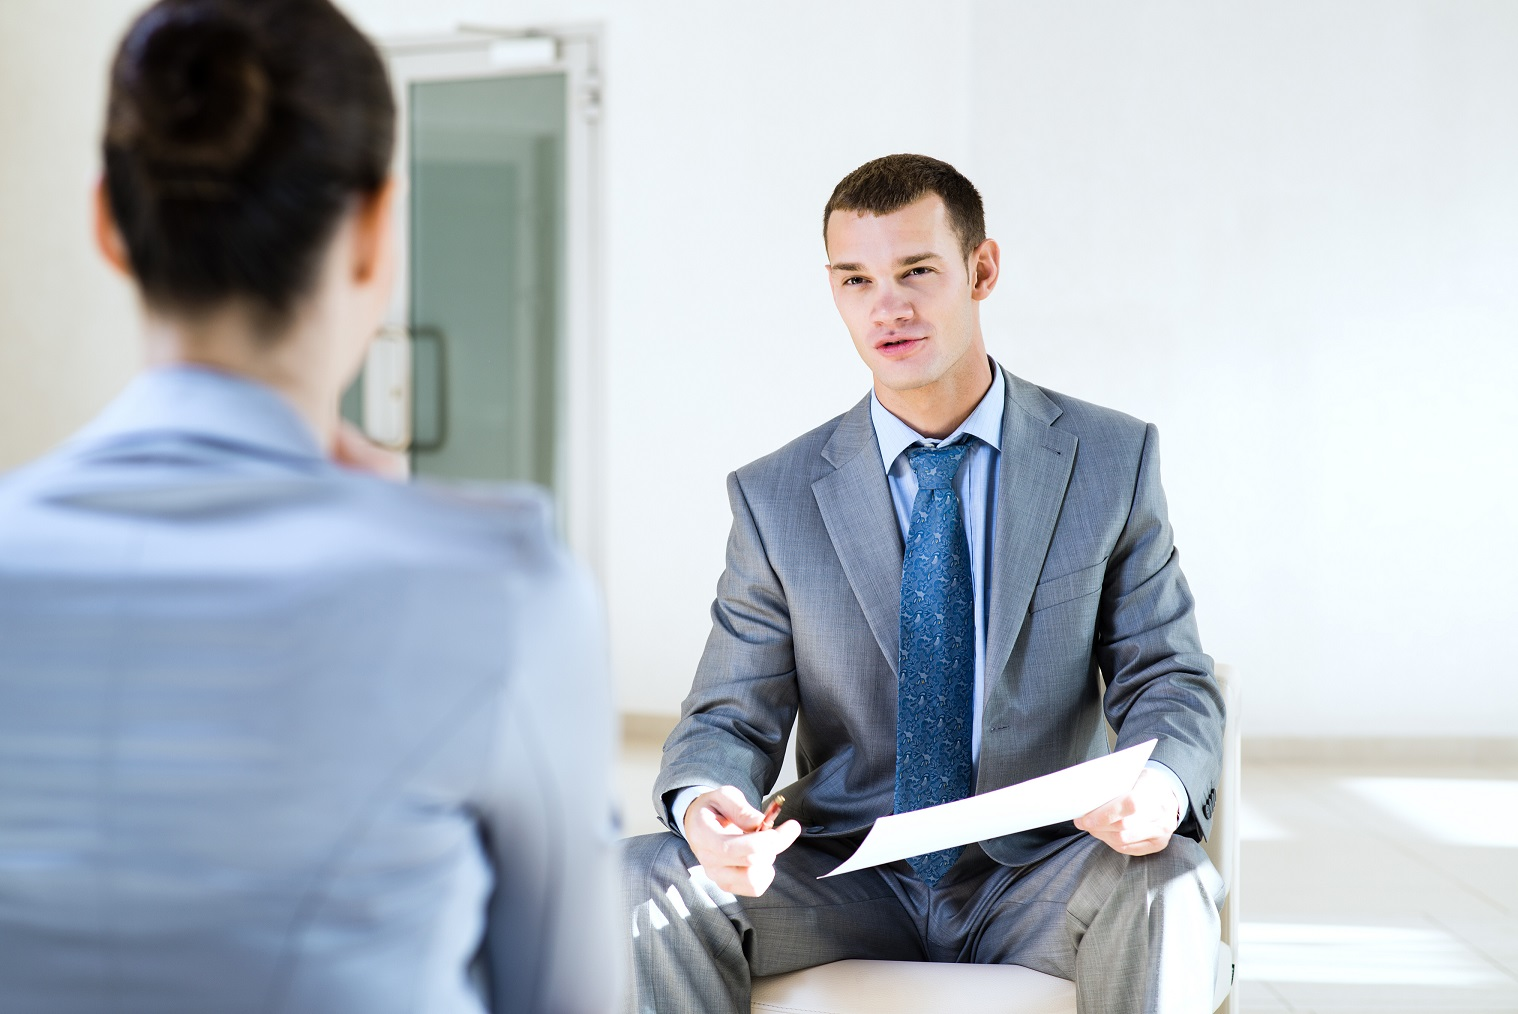 Ảnh: Recruitment Agency Now